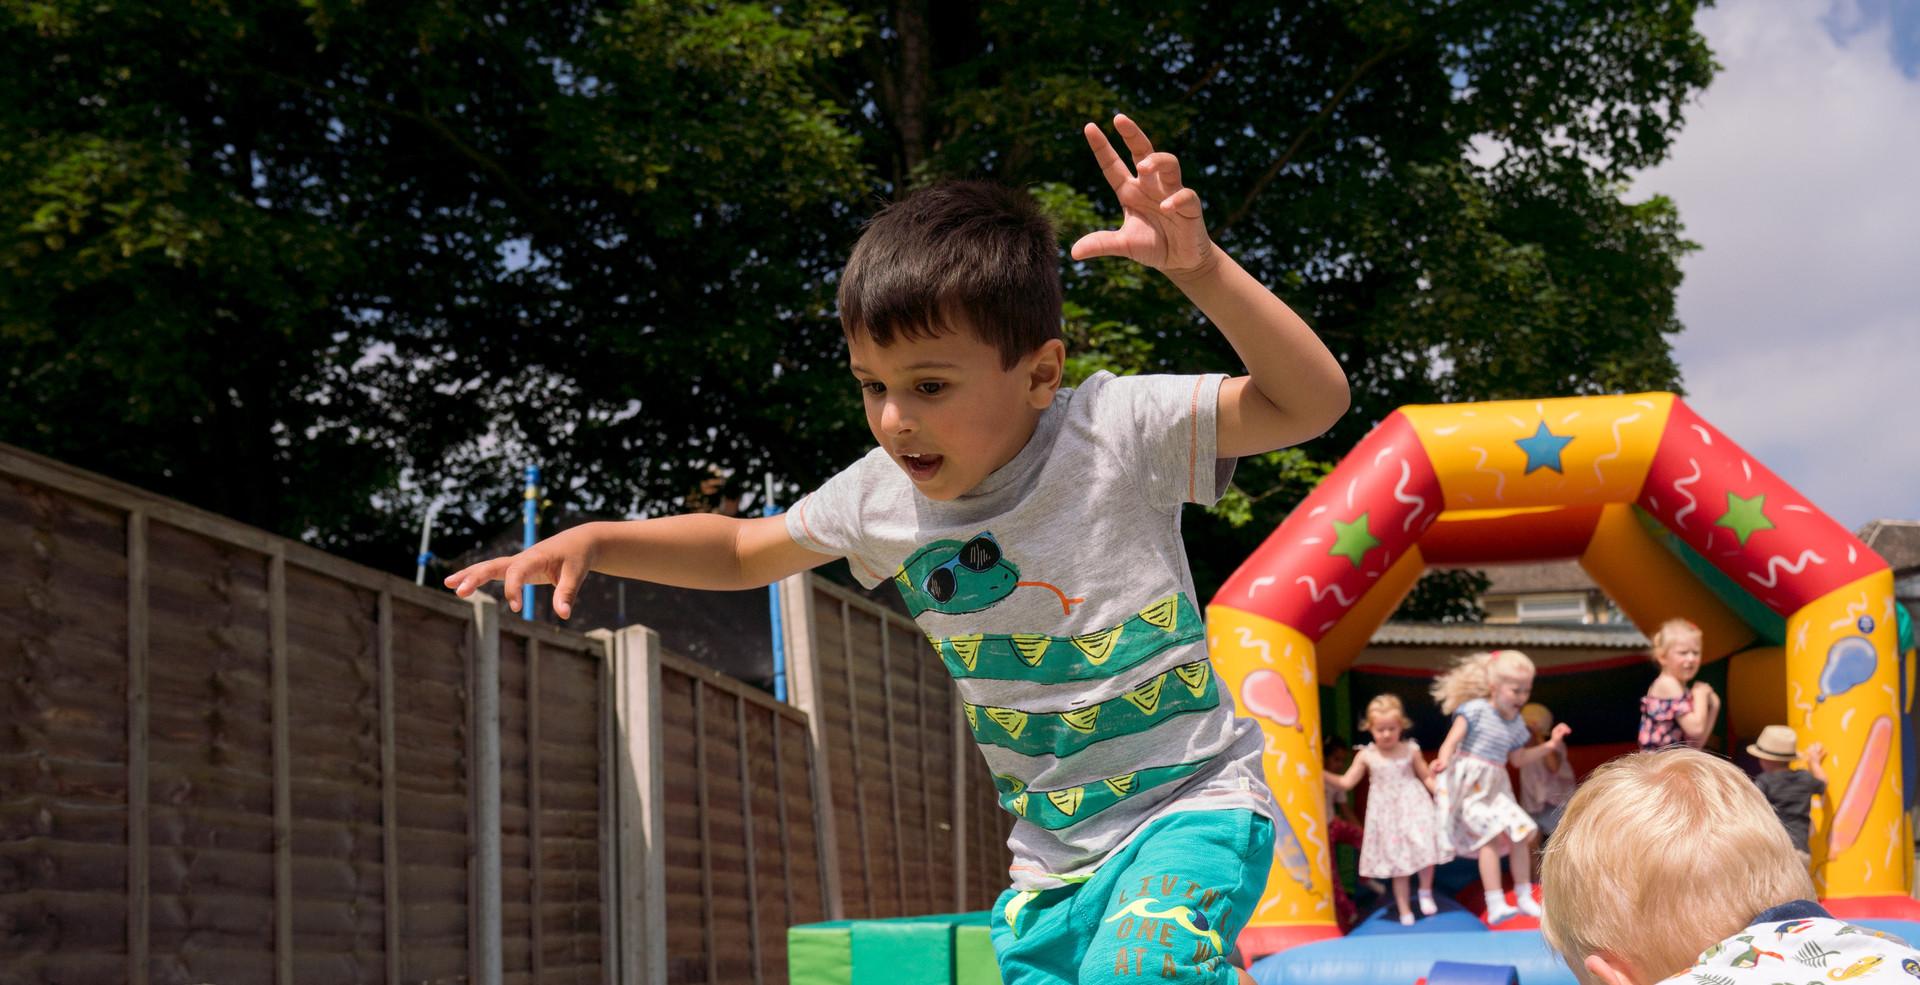 Childrens Party Birthday Jump.jpg